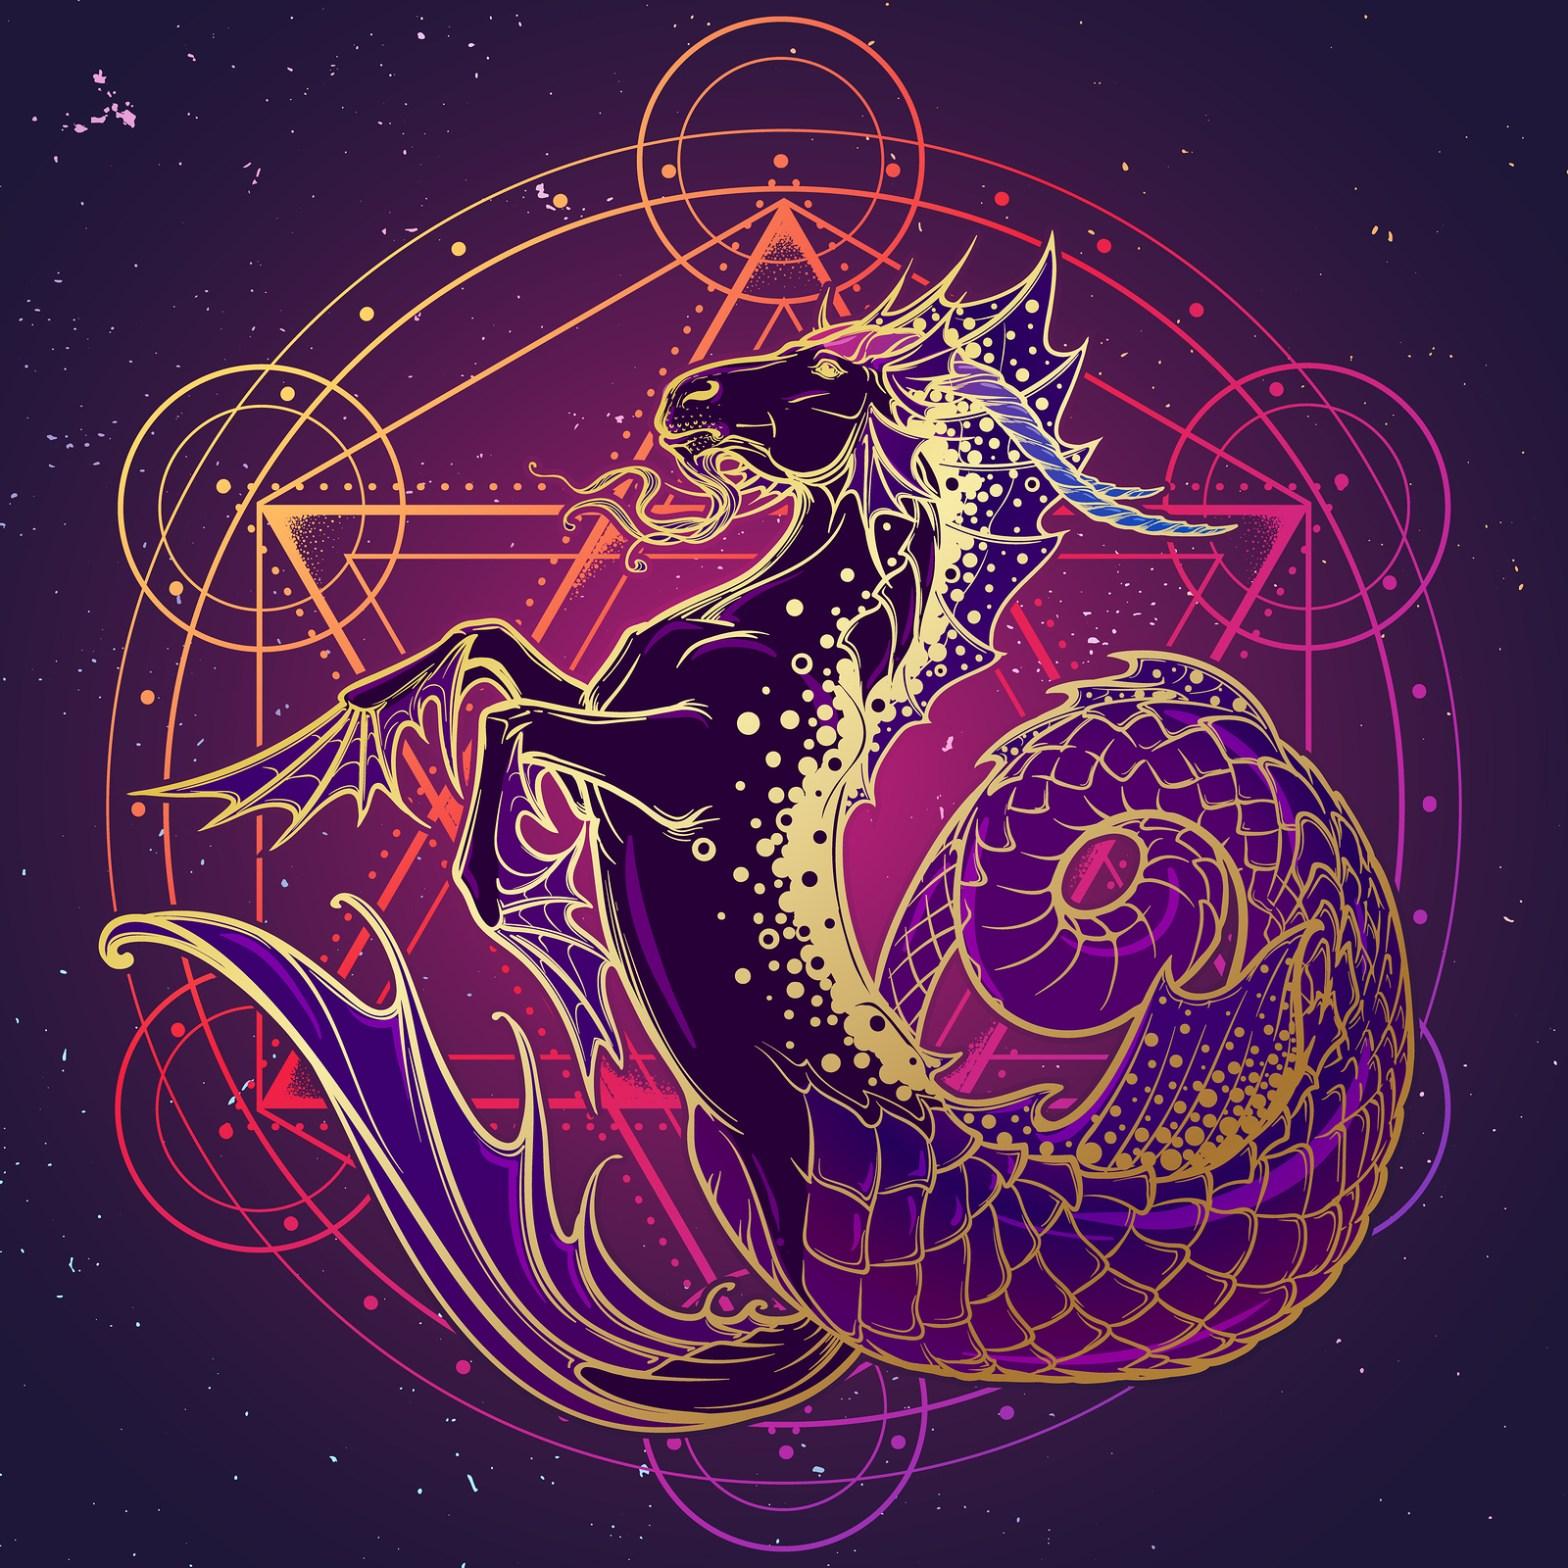 Capricorn, capricorn man, capricorn woman, capricorn men, capricorn women, capricorn zodiac, capricorn zodiac sign, lamarr, lamarr Townsend, lamarr Townsend tarot